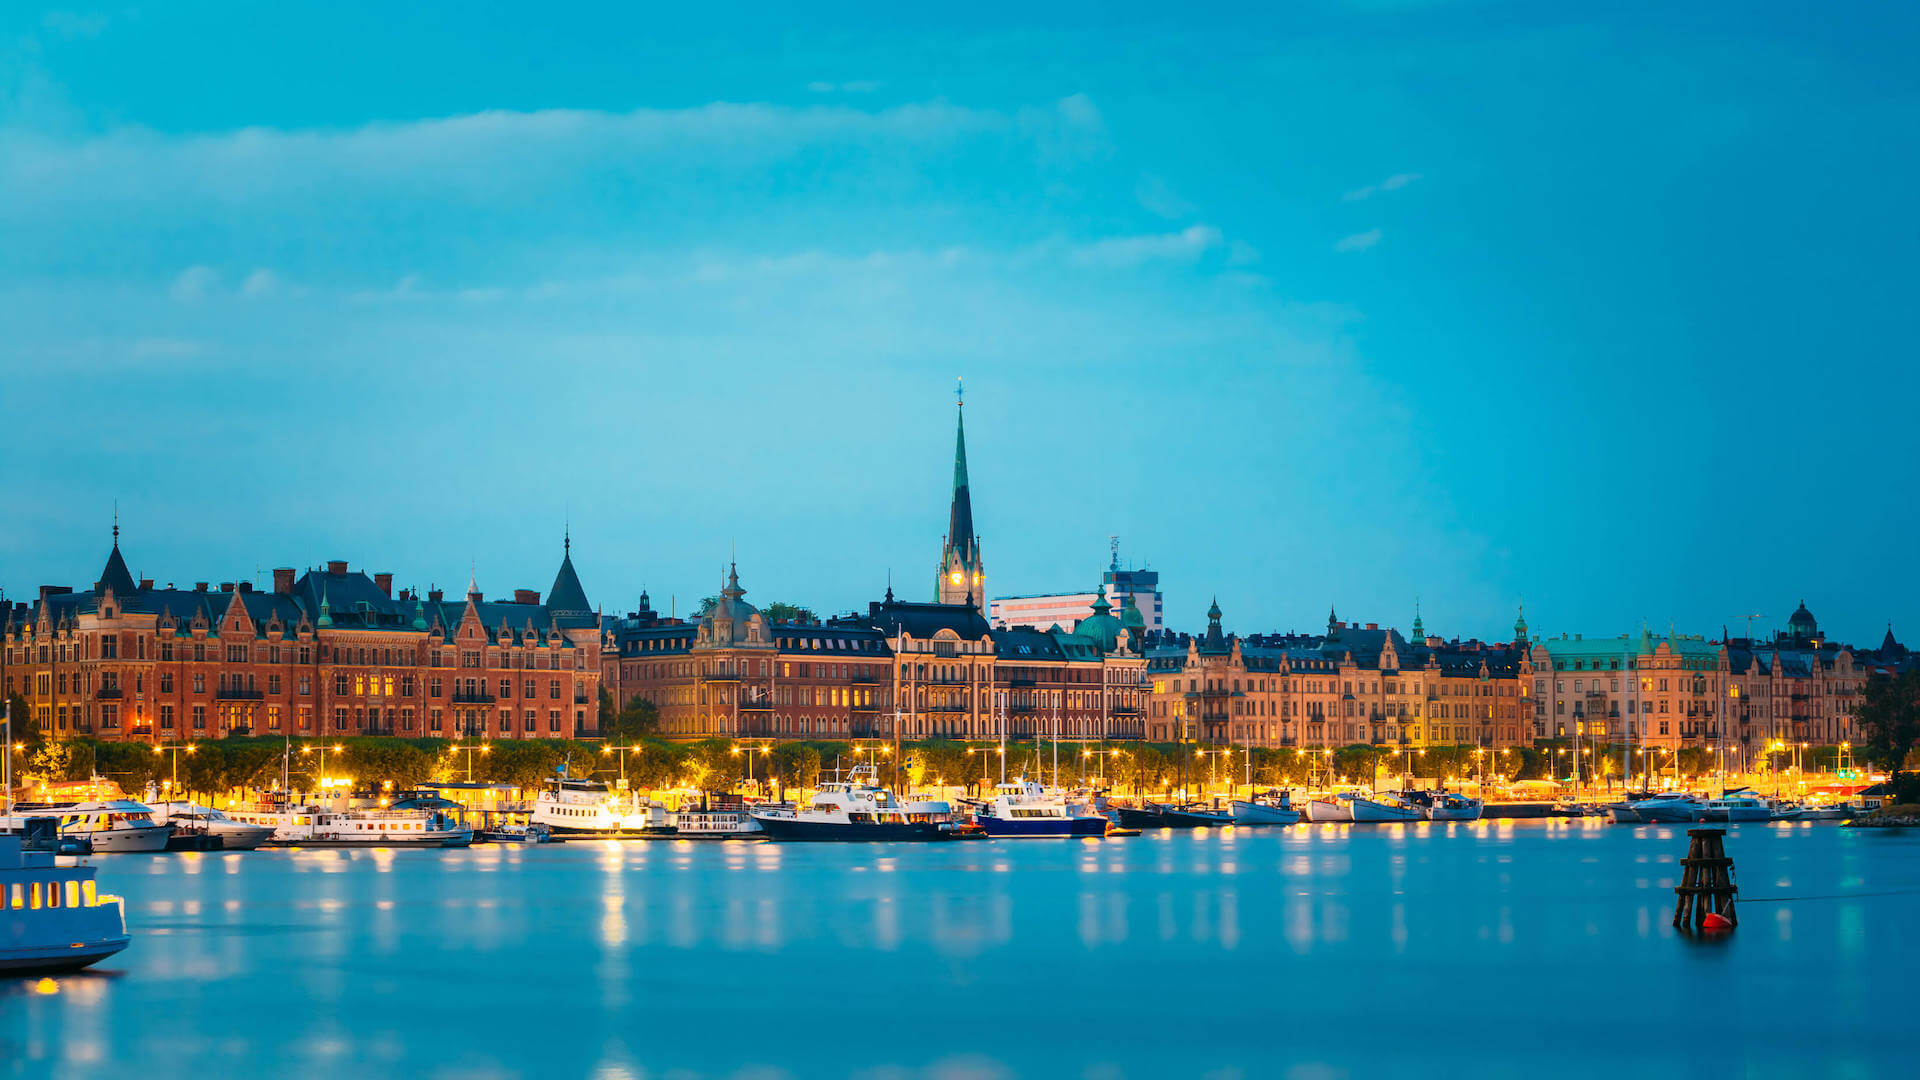 Hire Top Web & Mobile Development Team for Stockholm